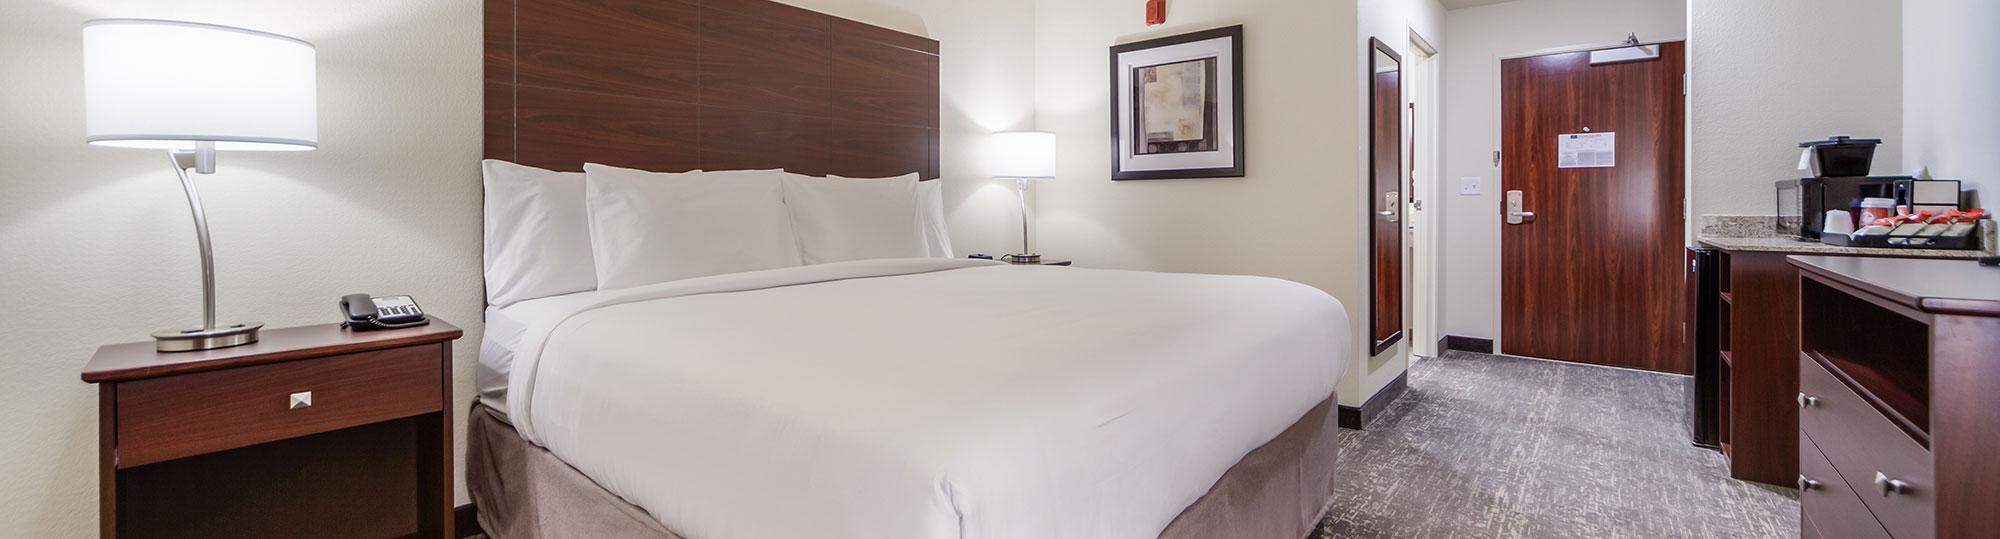 Cobblestone Inn & Suites Holdrege